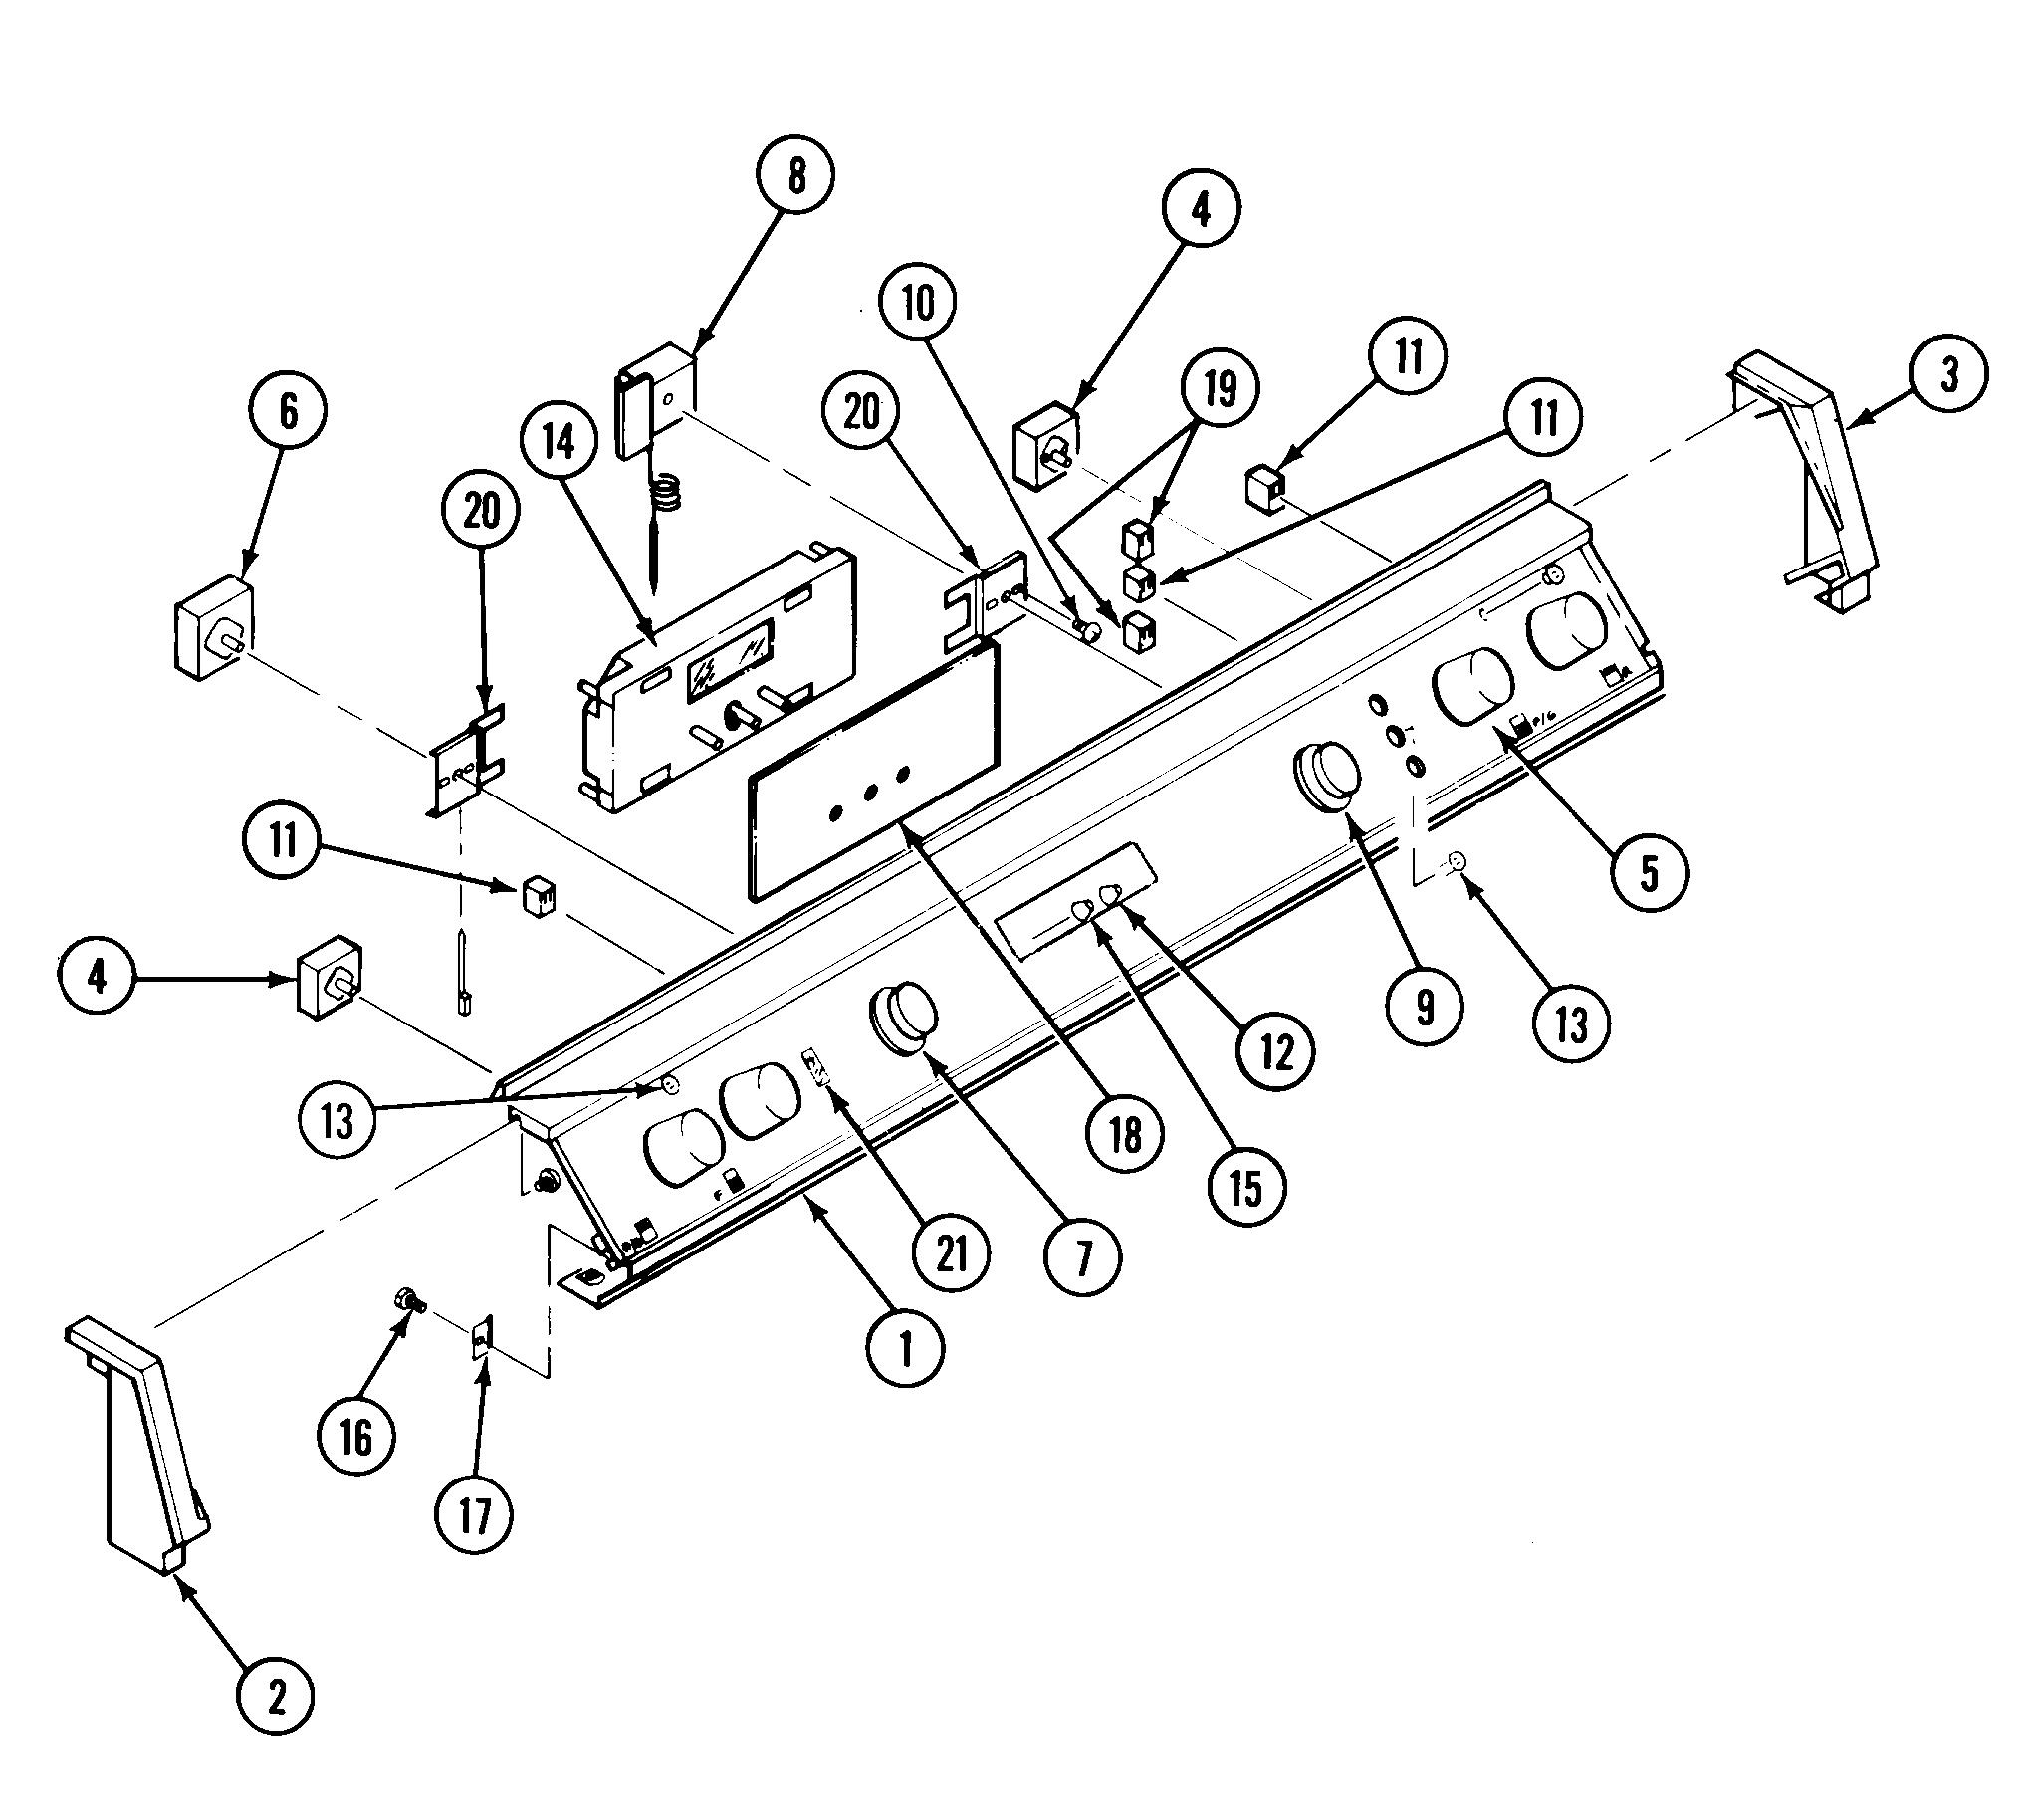 2029 air conditioning condensate drain diagram in addition diagram of air 383838 1828